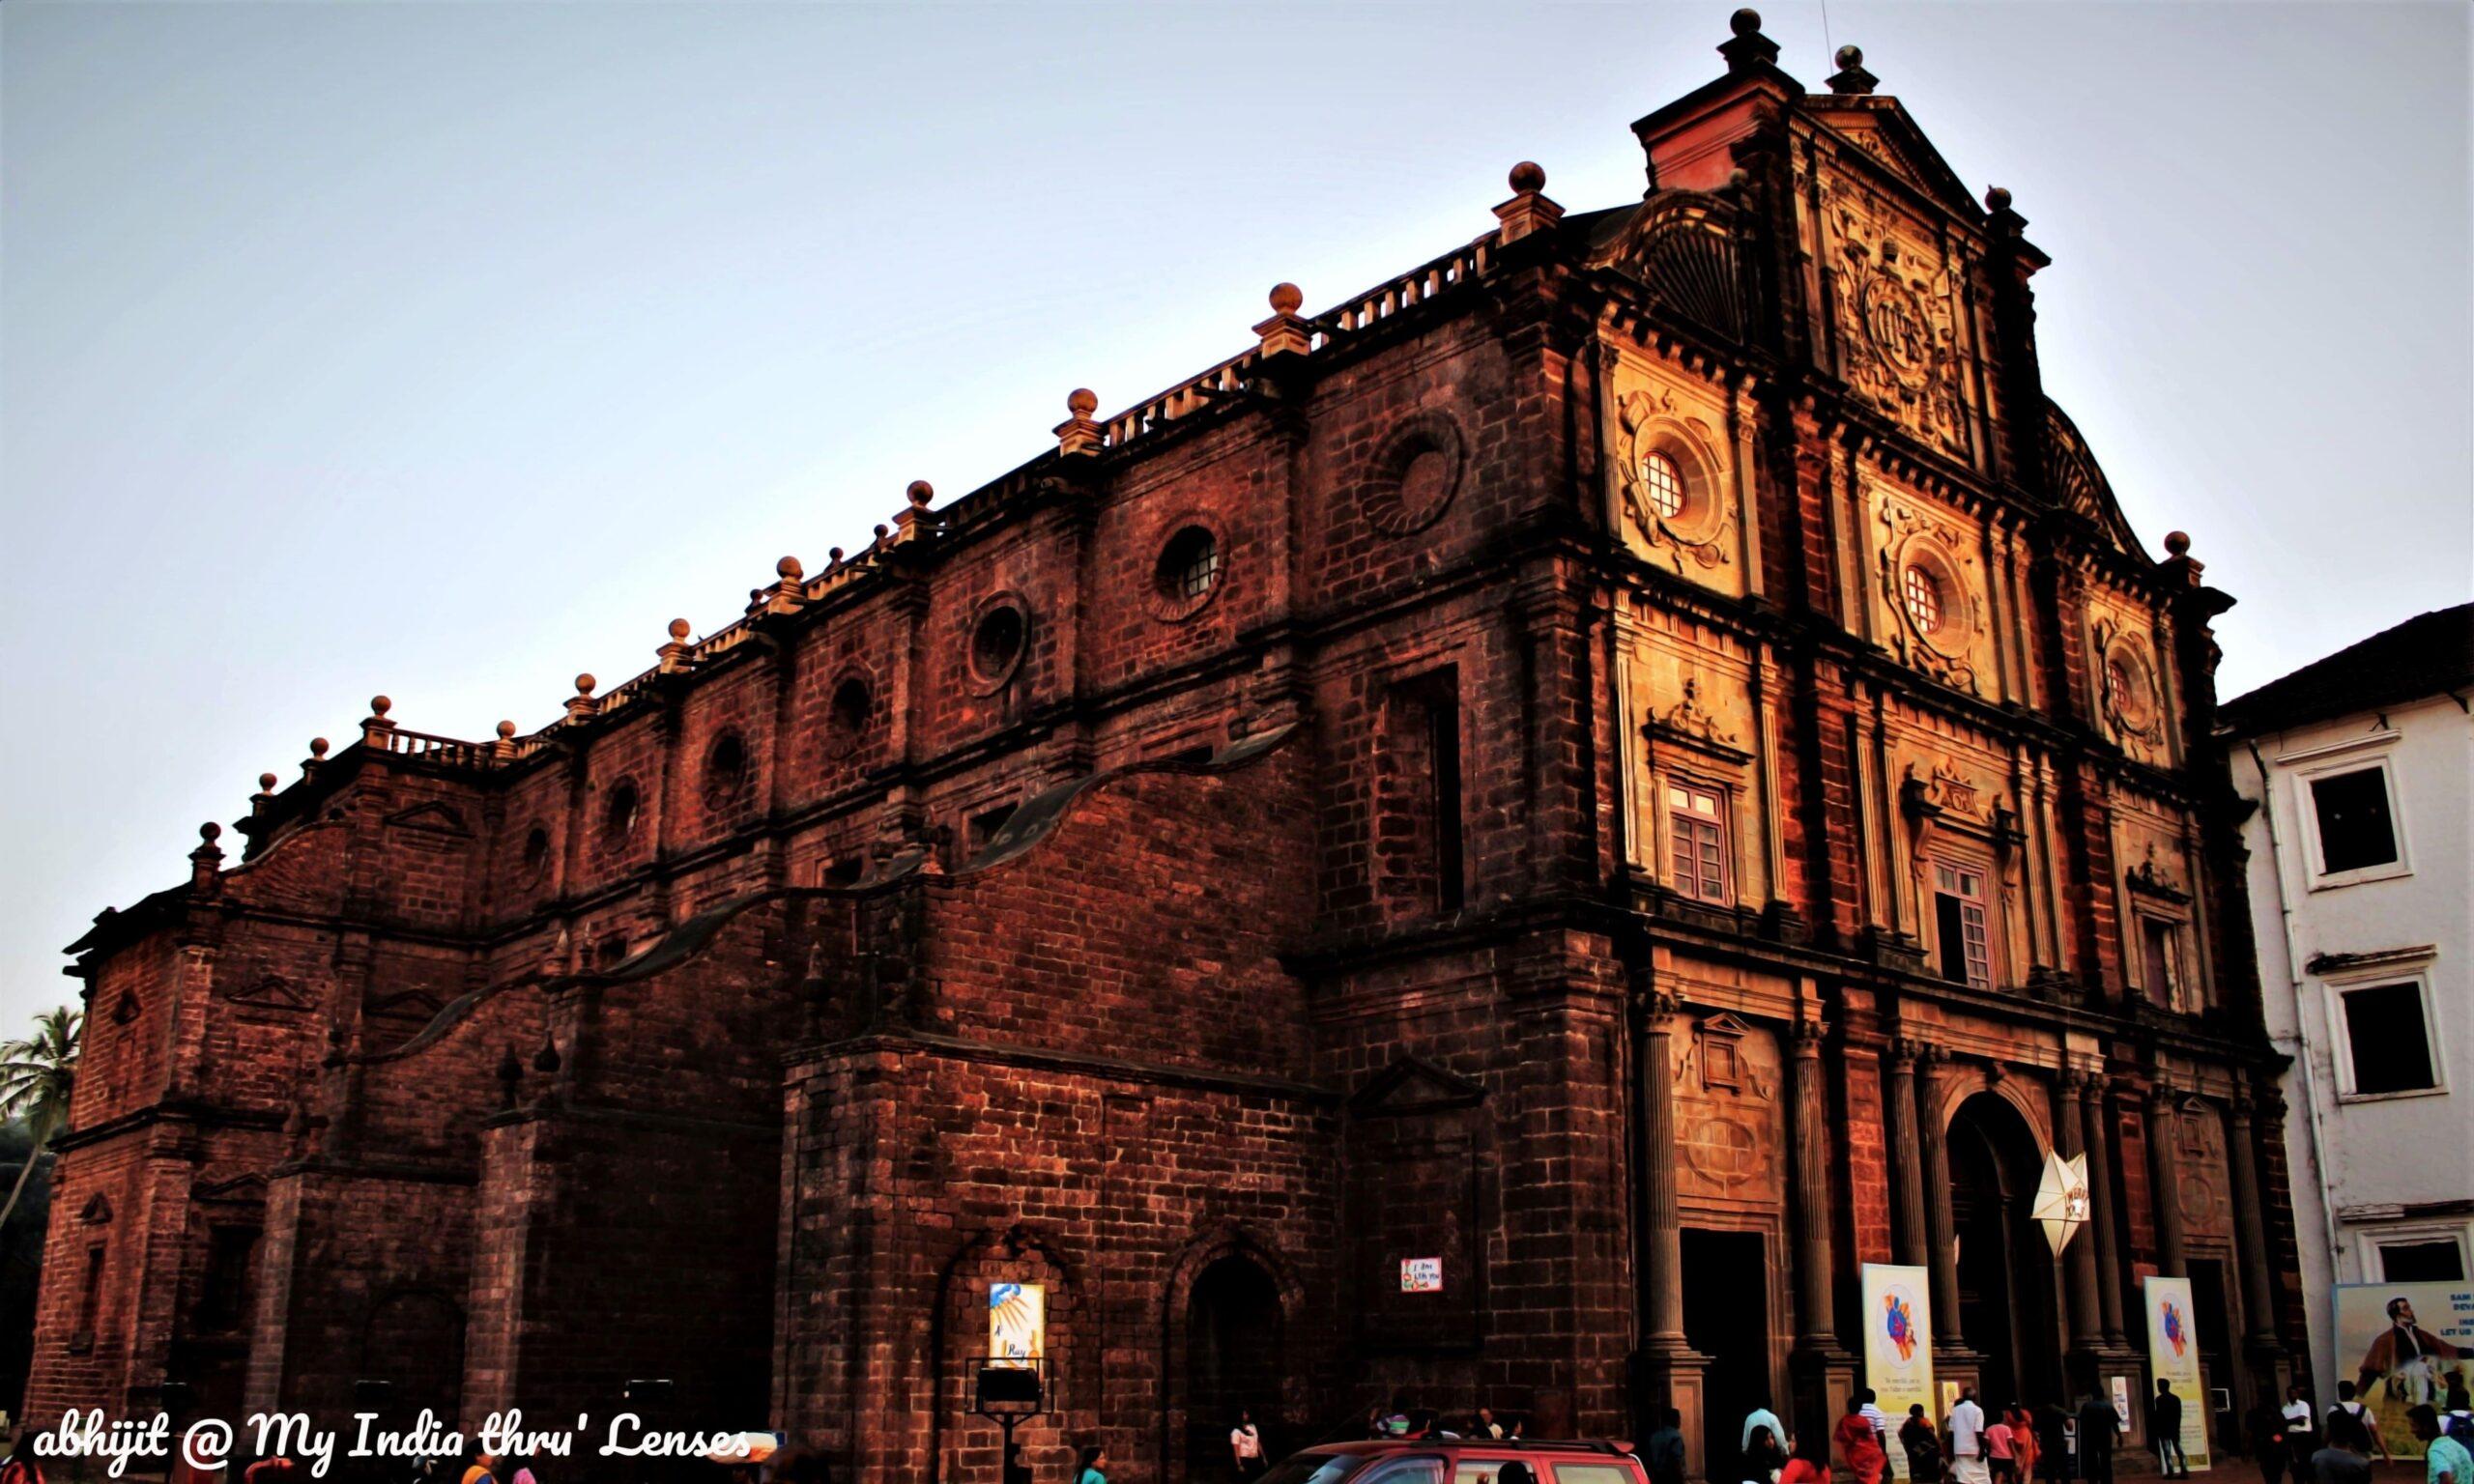 Churches & Convents of Goa